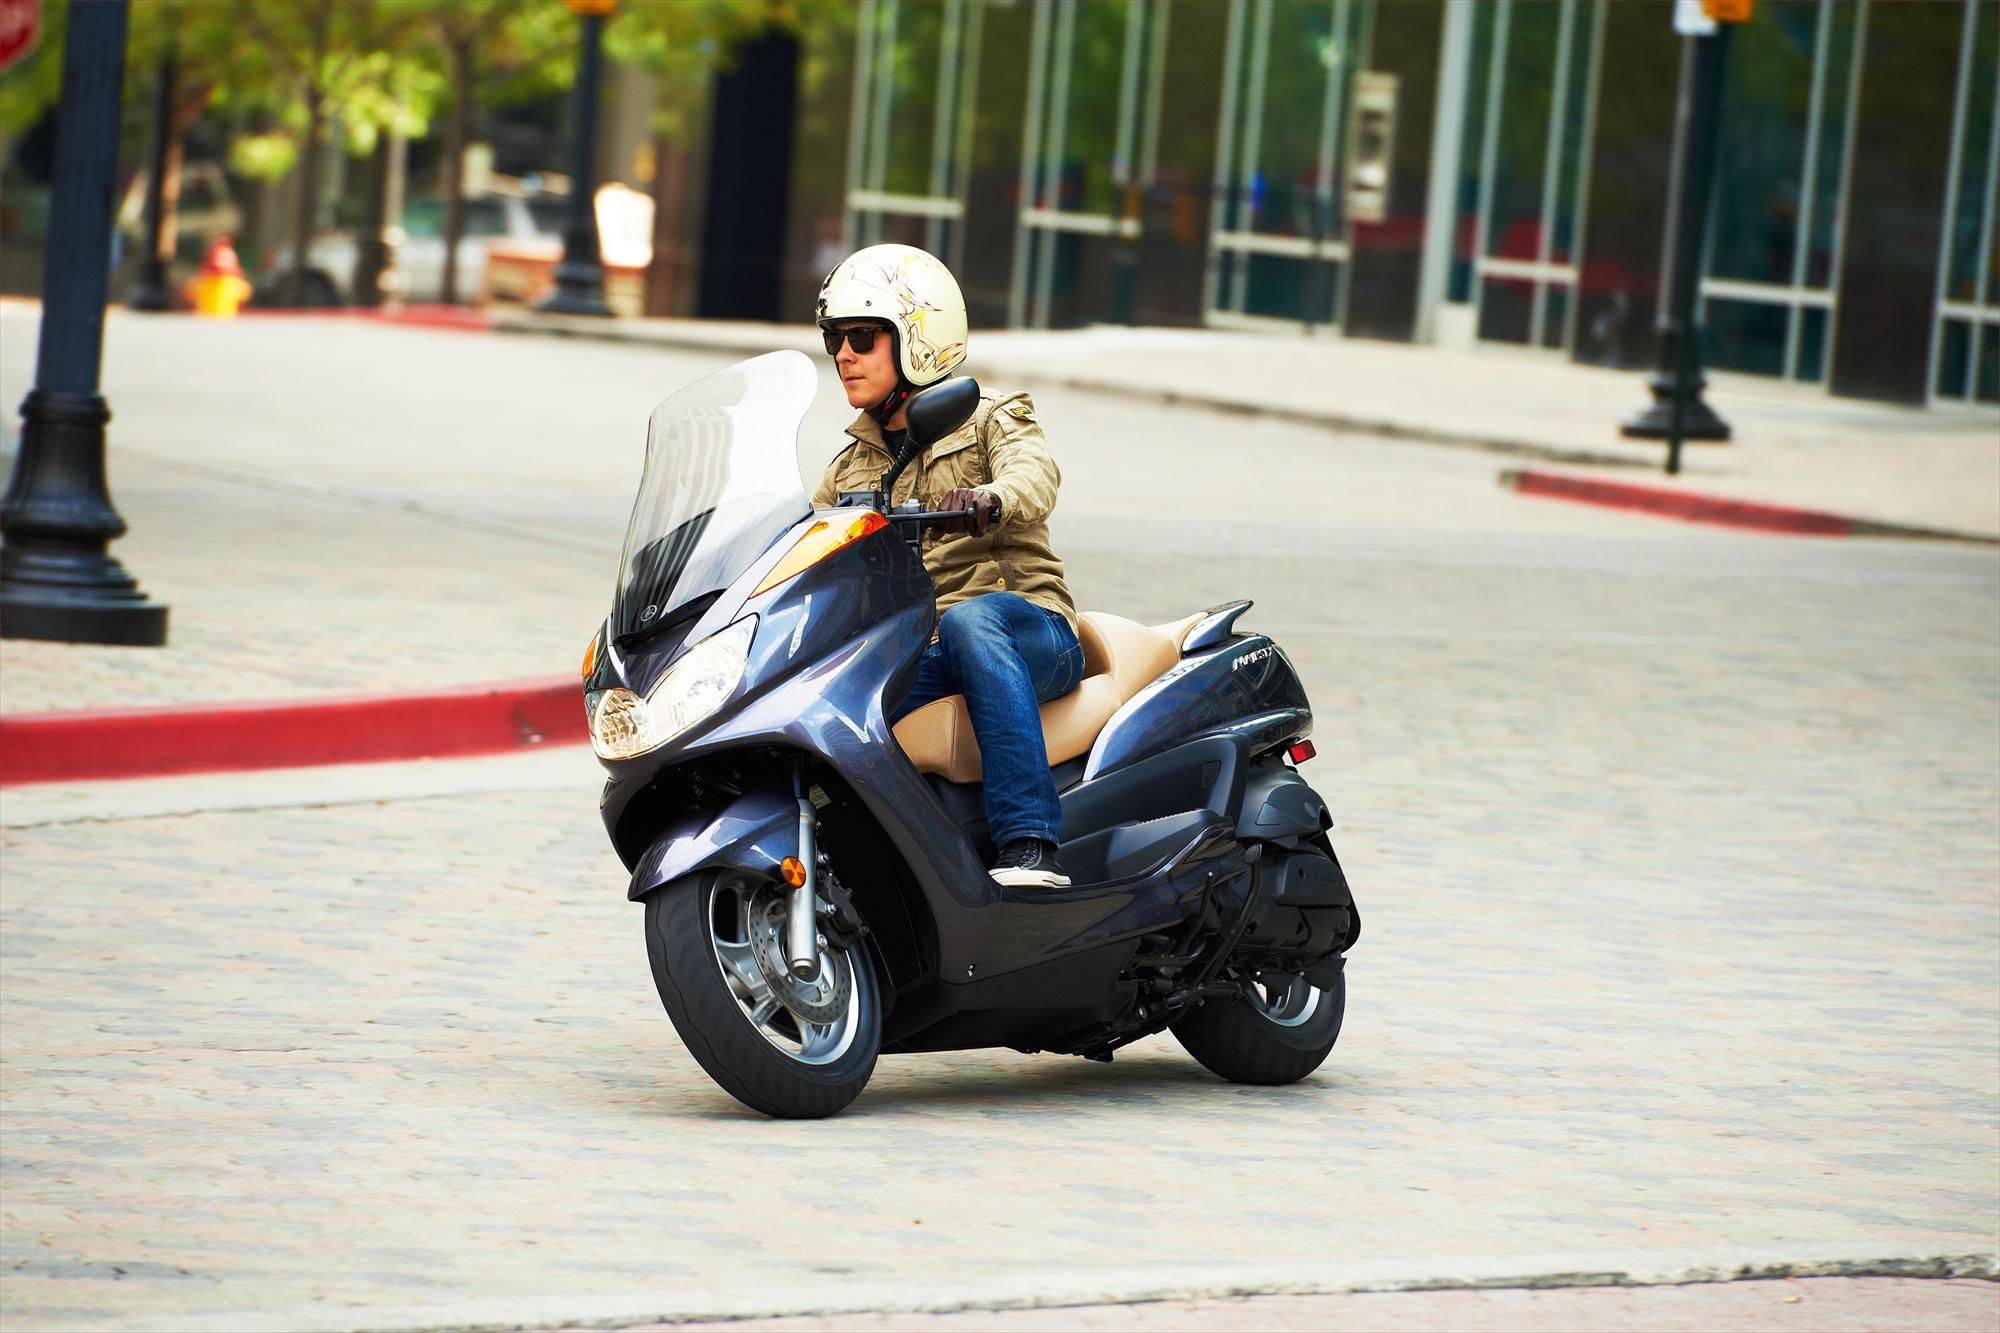 2009 Yamaha R1 Throttle Position Sensorbmw R1200rt Wiring Diagram 2014 Majesty Specs 2004 2005 2006 2007 2008